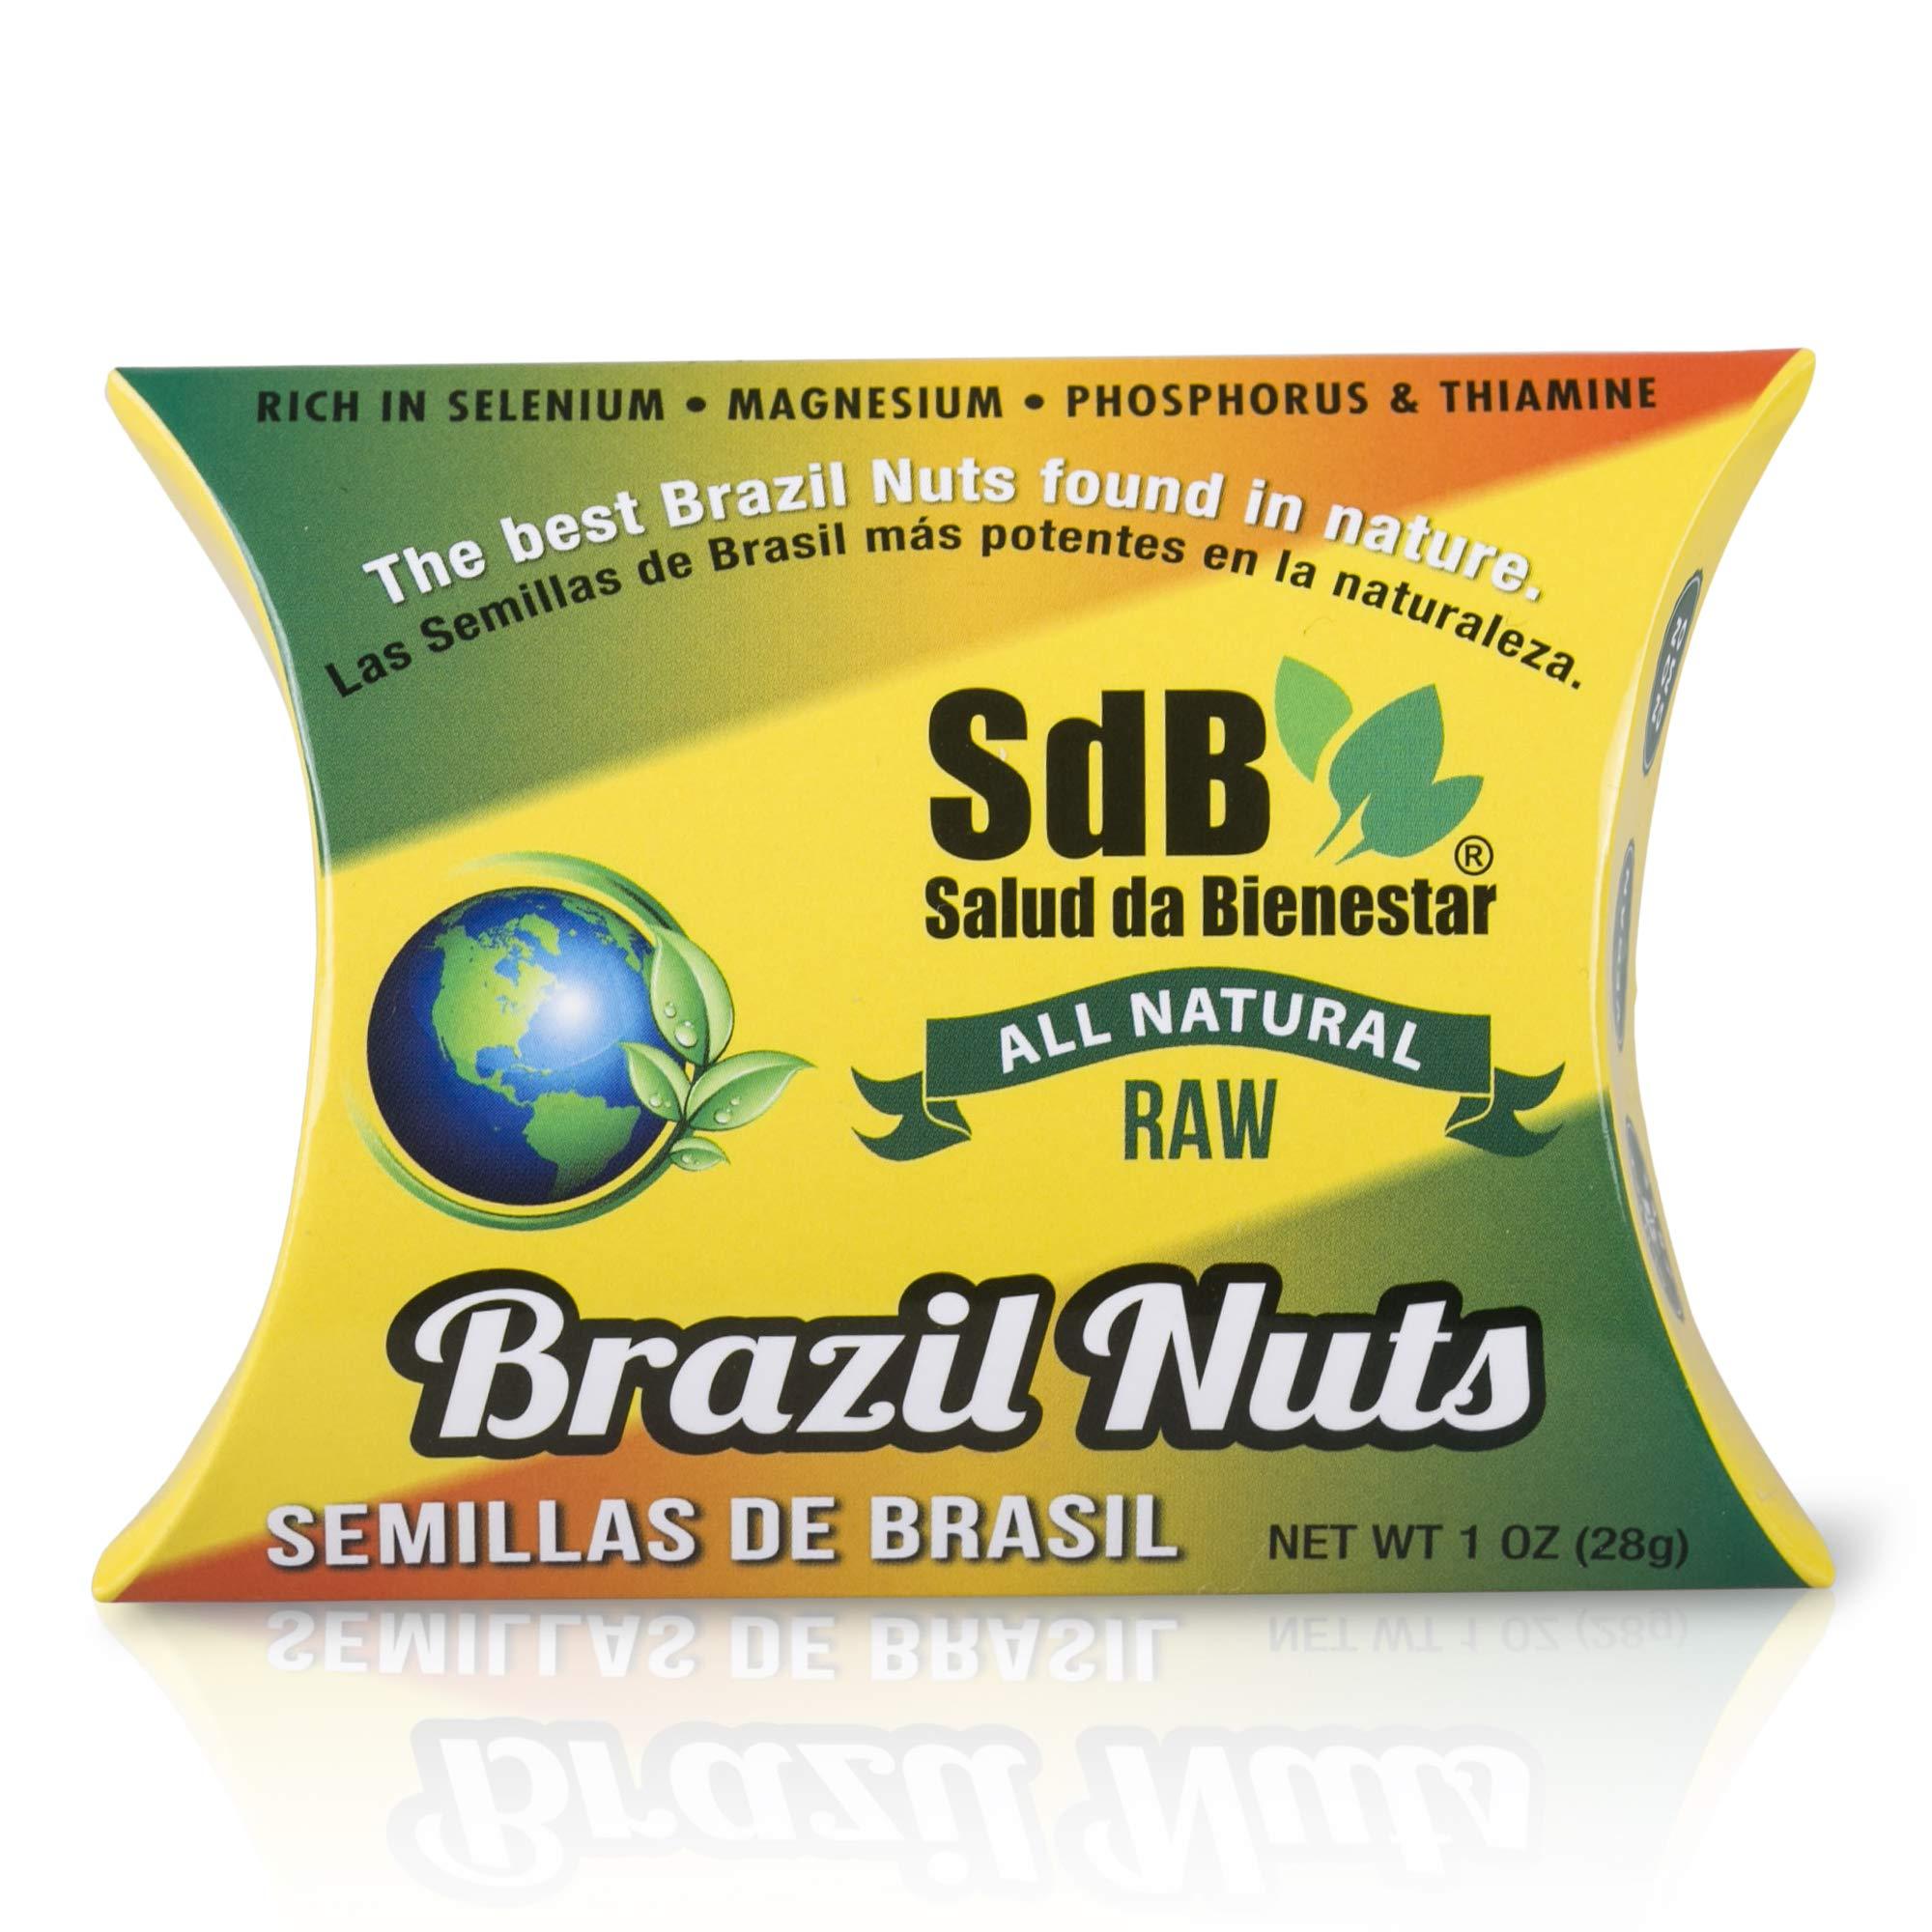 SALUD DA BIENESTAR, Semilla de Brasil, New Professional Packaging! 100% Original,